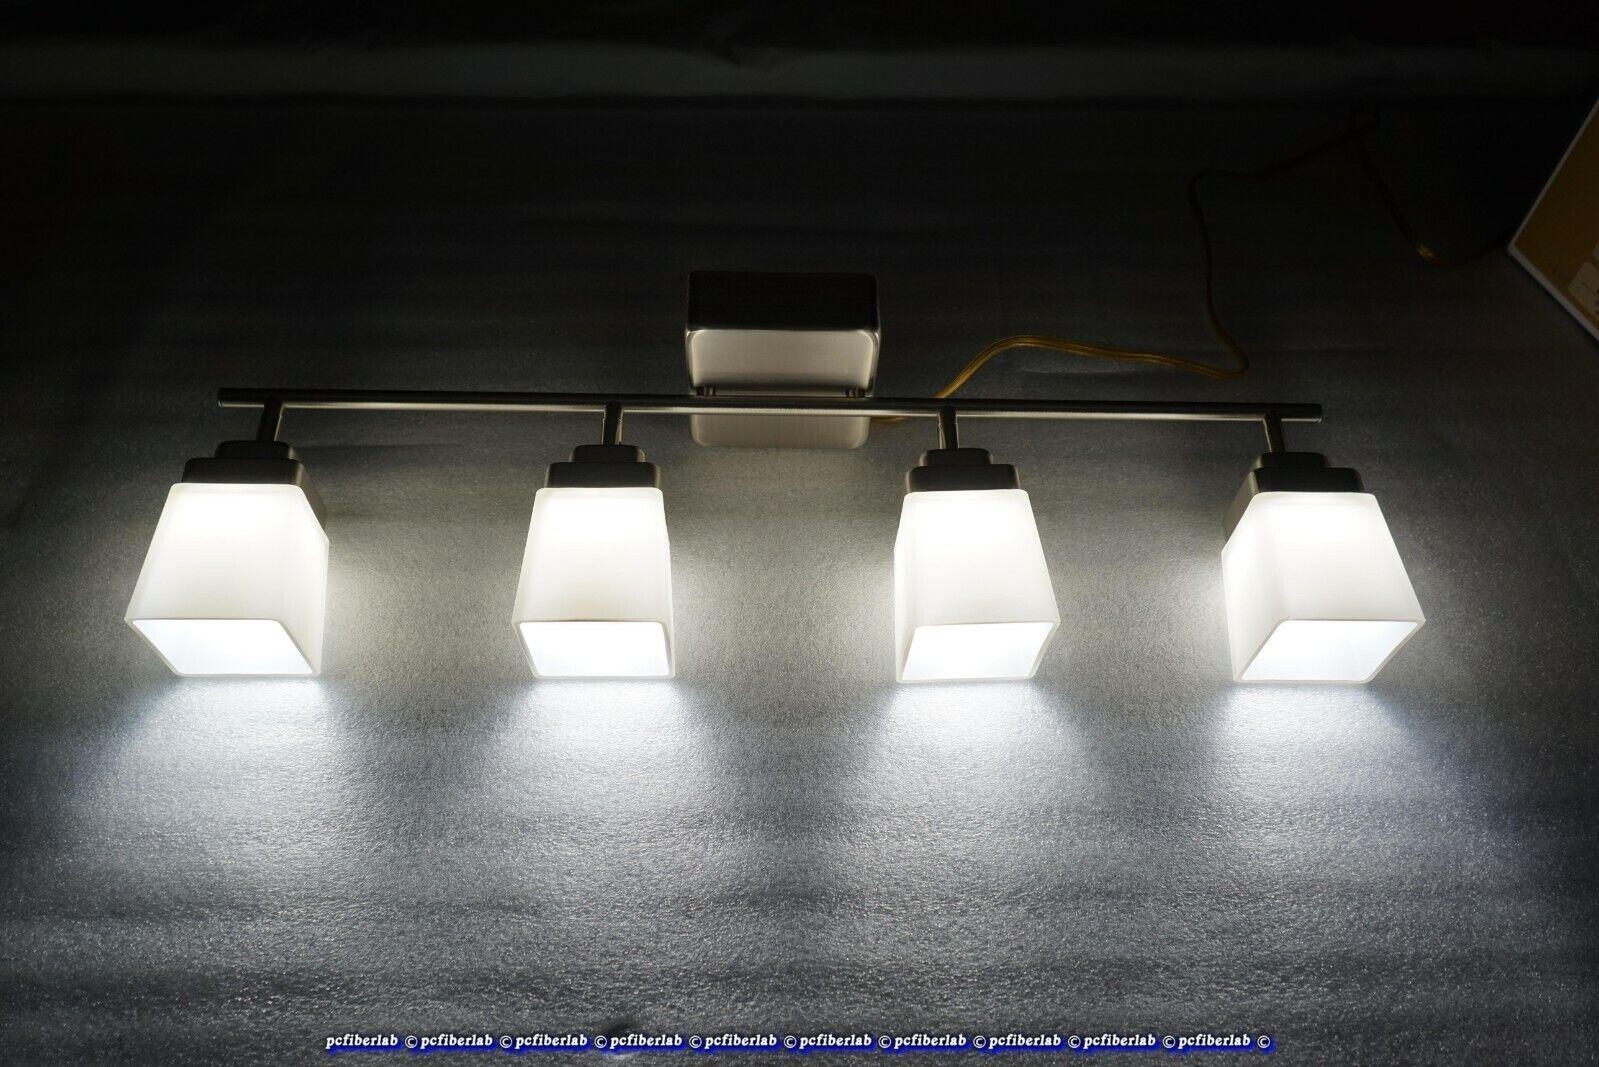 Picture of: Hampton Bay 4 Light Led Directional Track Lighting Kit Brushed Nickel Finish For Sale Online Ebay